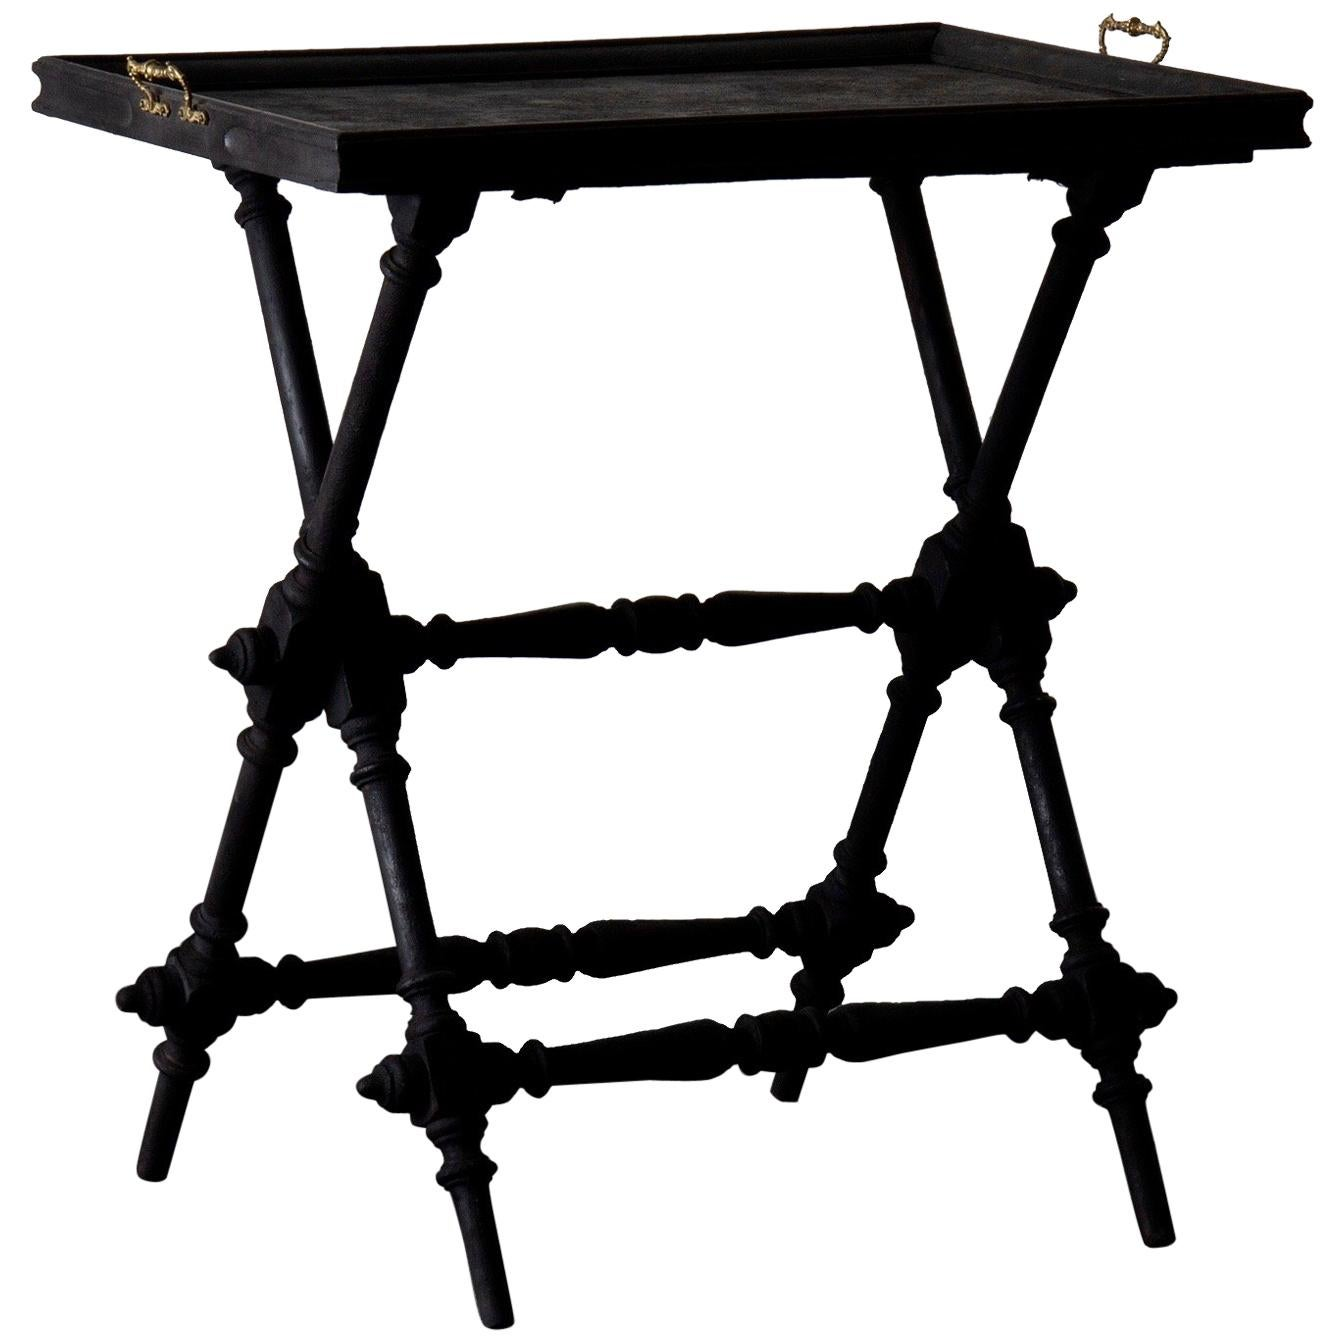 Table Tray Swedish Black, 19th Century, Sweden